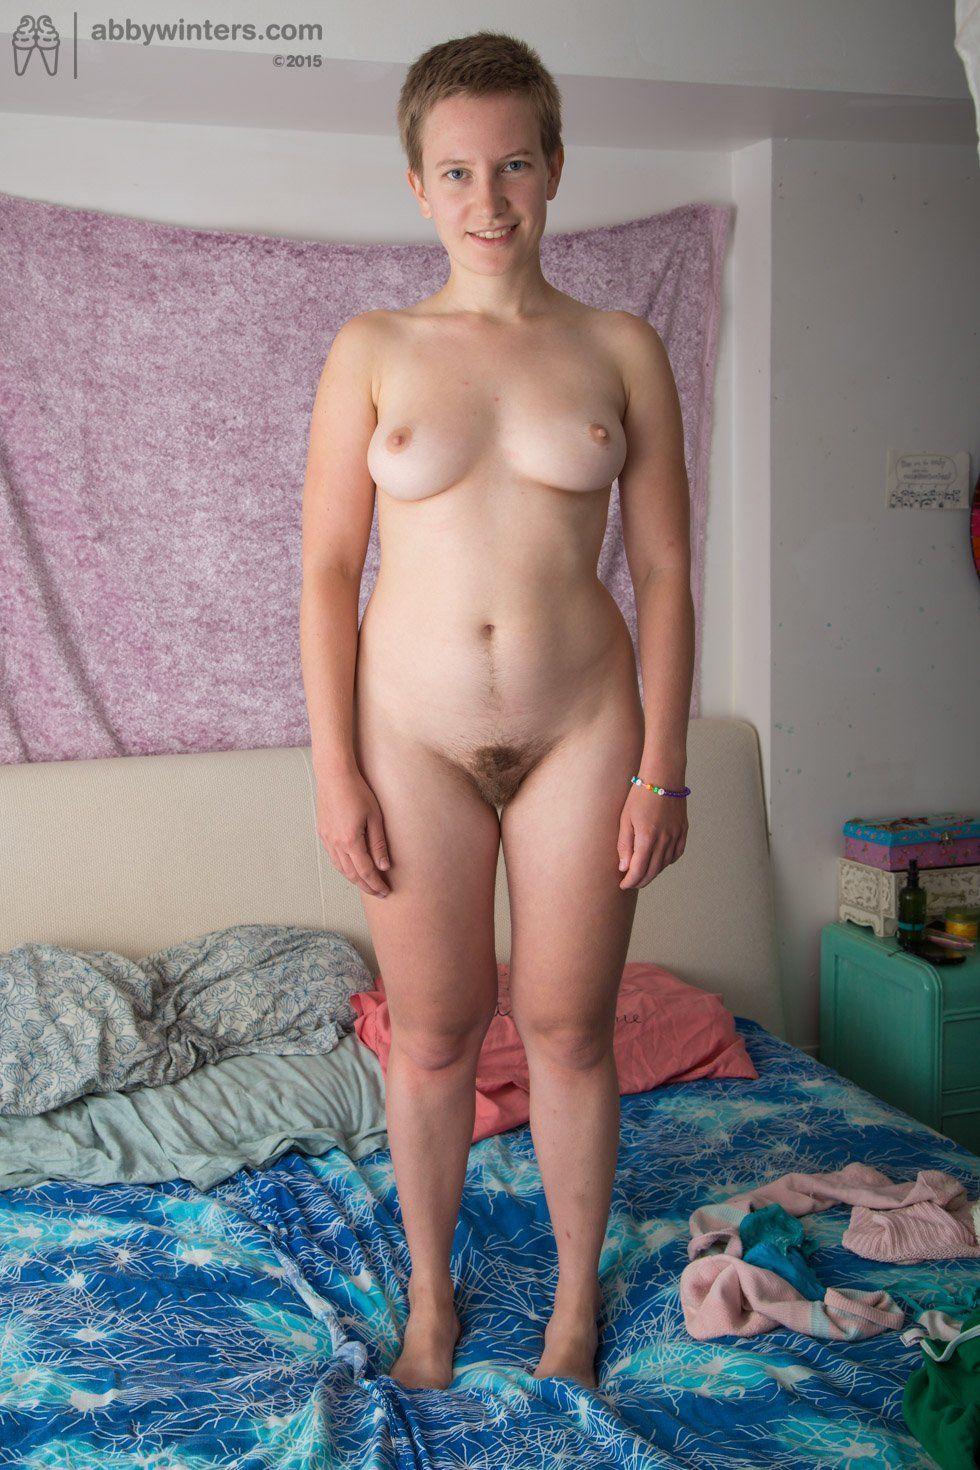 Nude short woman